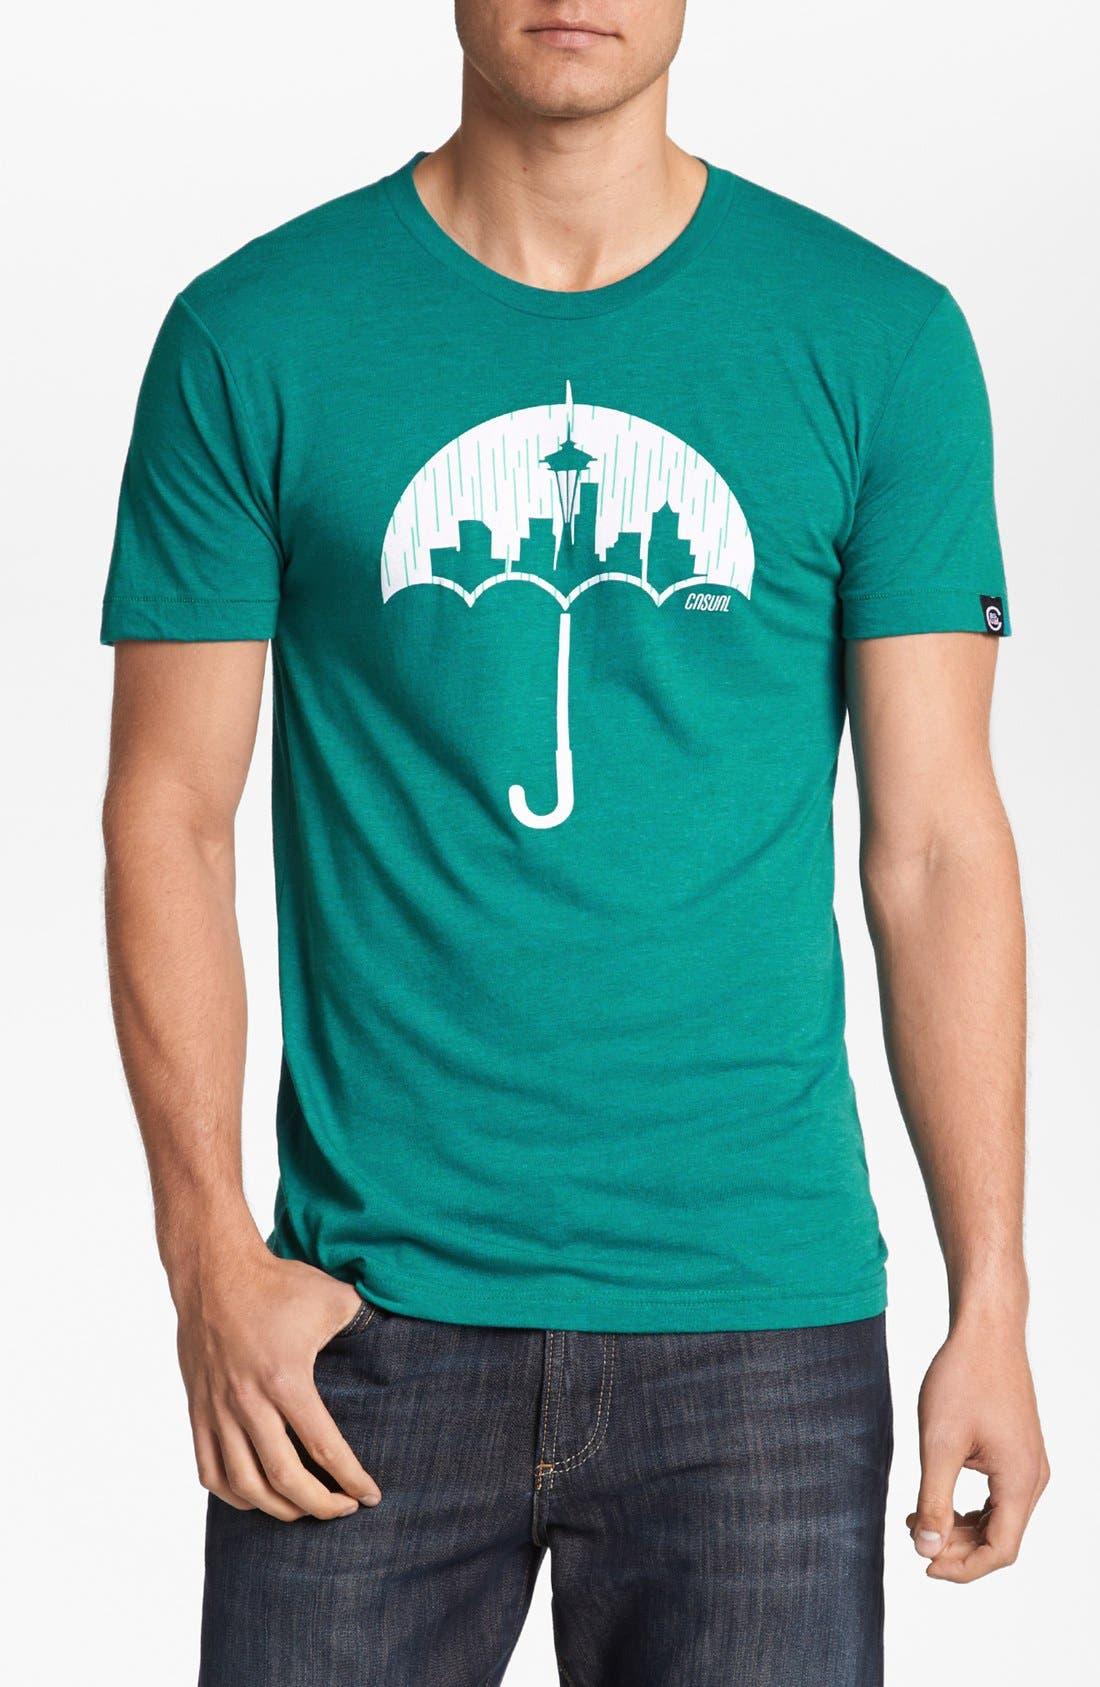 Main Image - Casual Industrees 'Umbrella Rain' Graphic T-Shirt